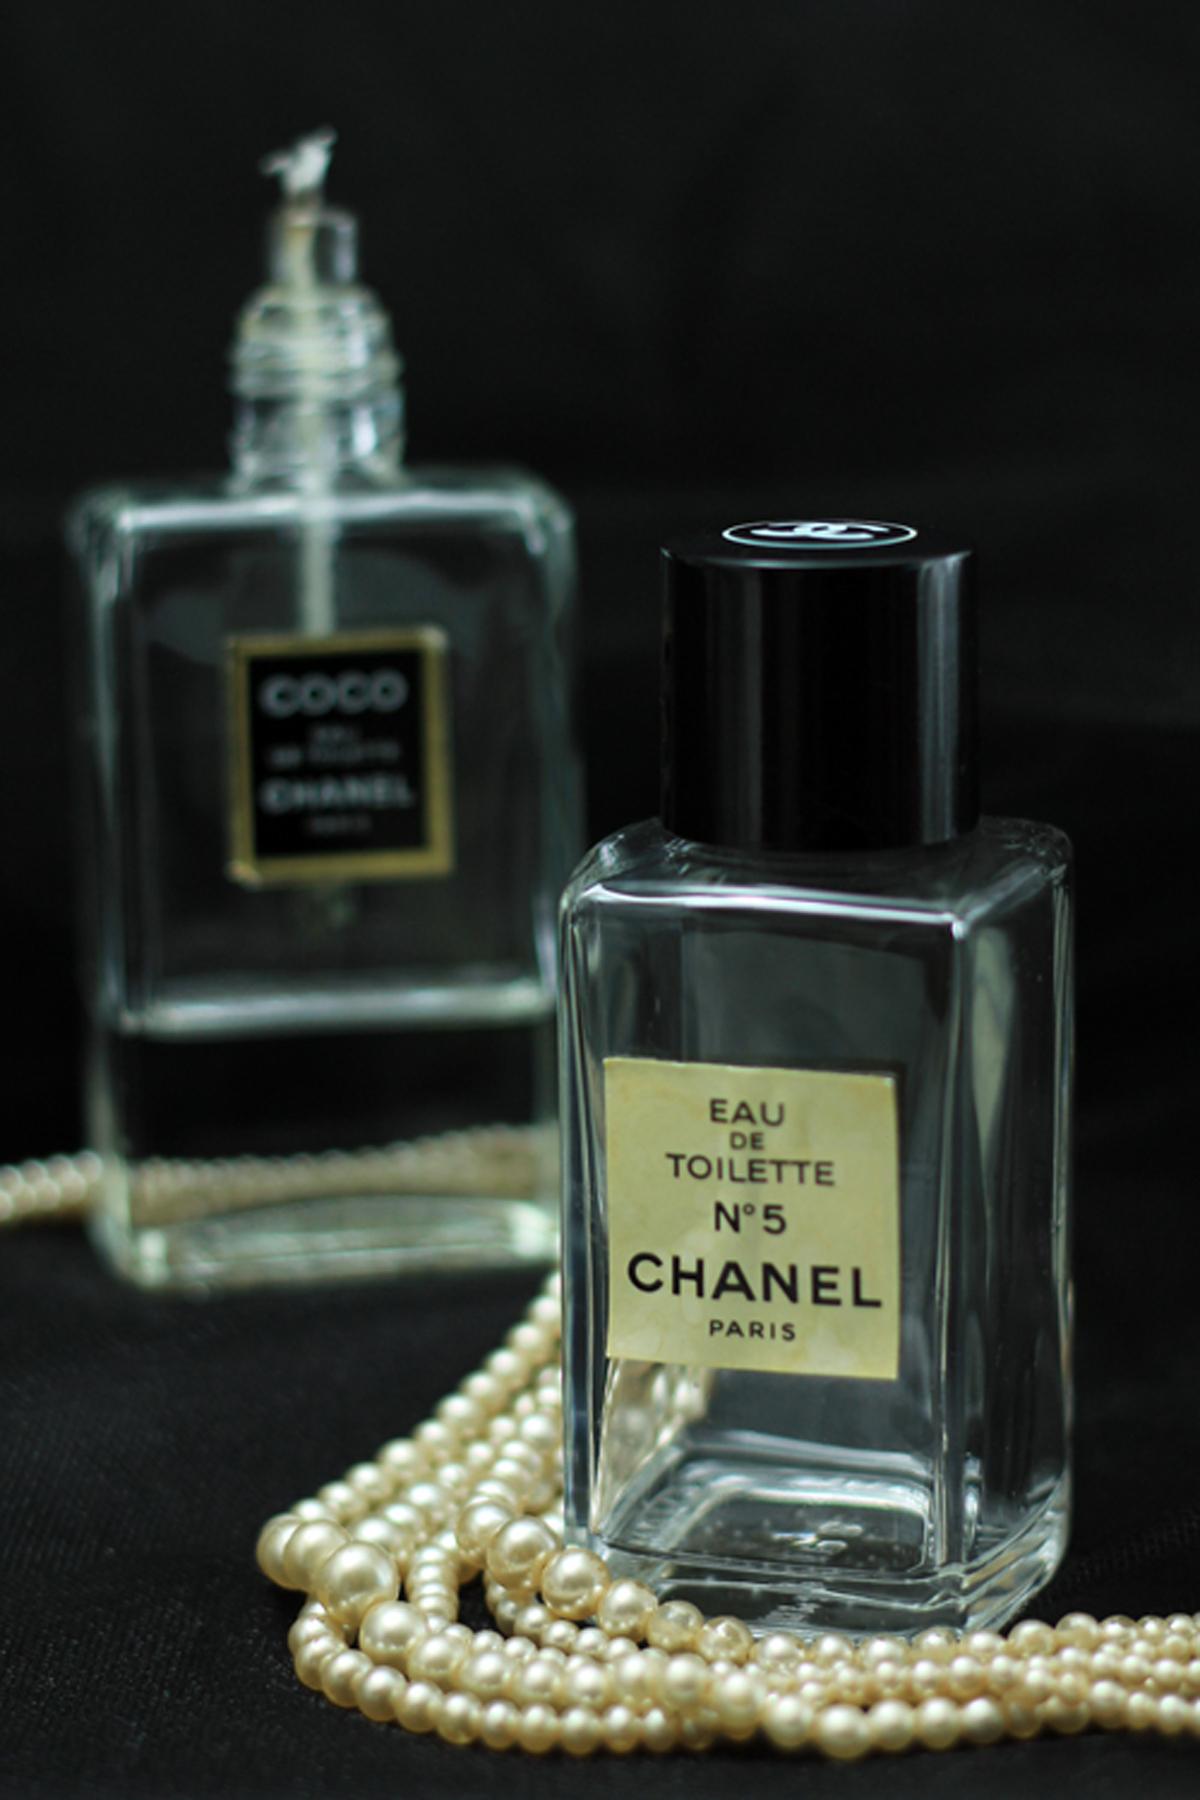 Dating chanel perfume bottles